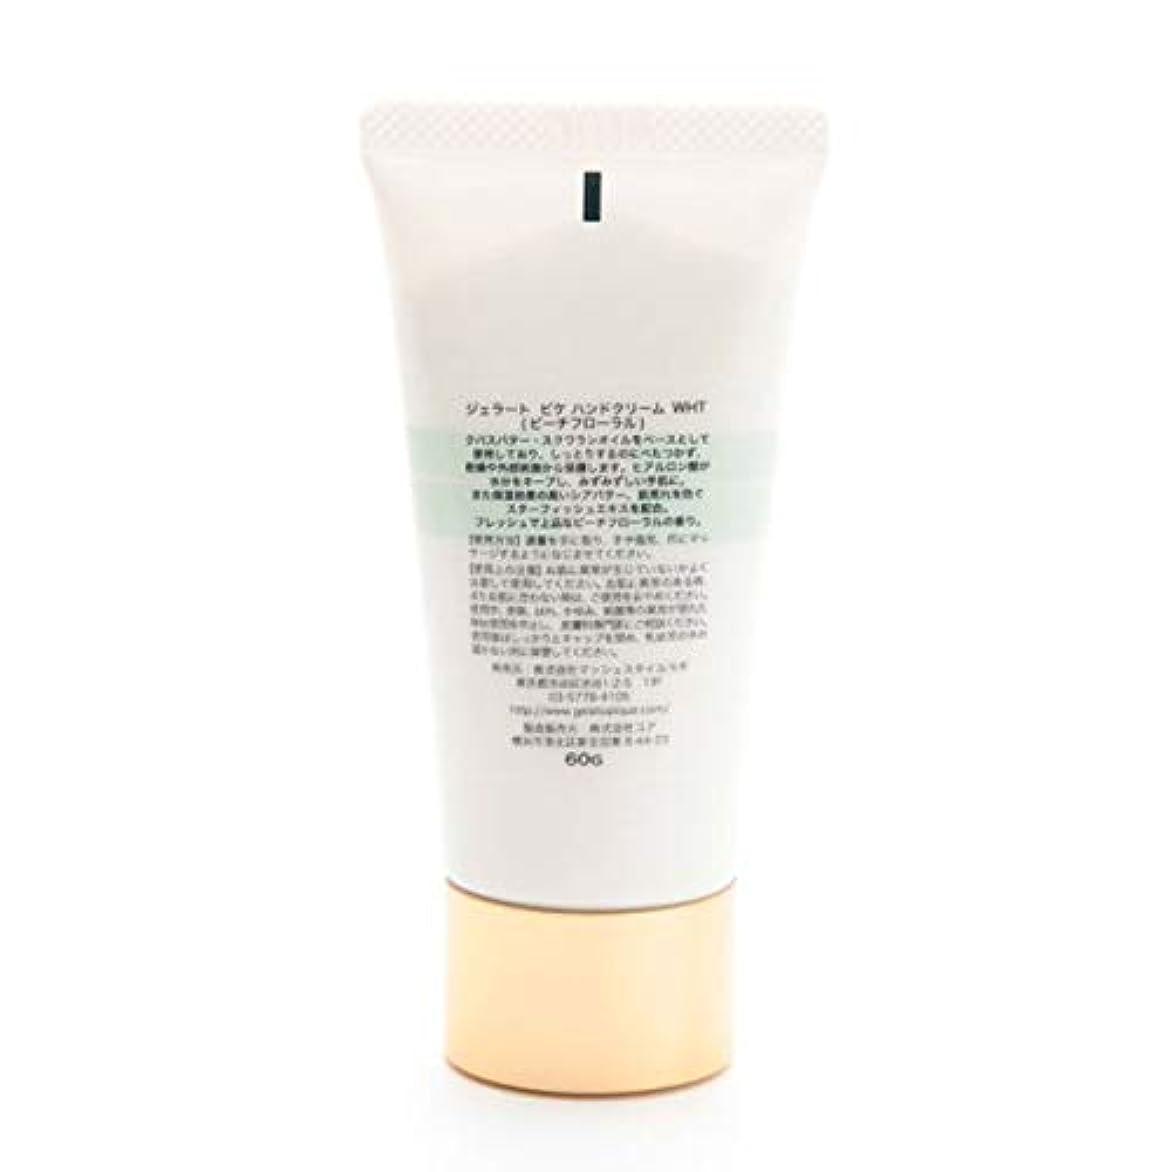 gelato pique ジェラートピケ [COSME MARCHE]ハンドクリーム pwlc149019 WHITE F